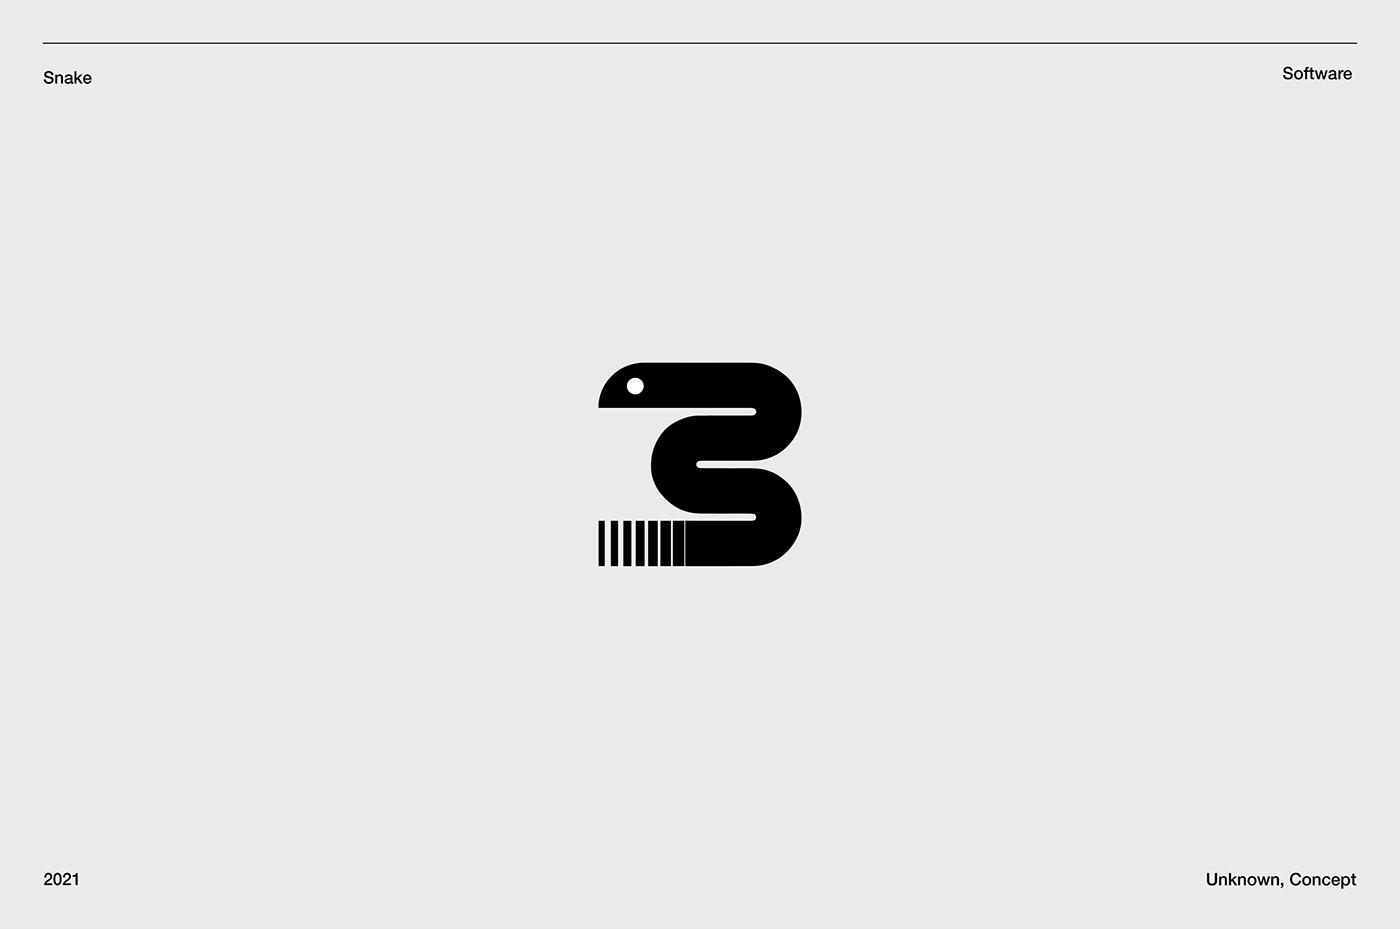 architecture,black and white logo,Design Agency Logo,expensive logo design,Graphic Designer,logo,Logo Design,luxury logo design,Minimalism,professional logo design